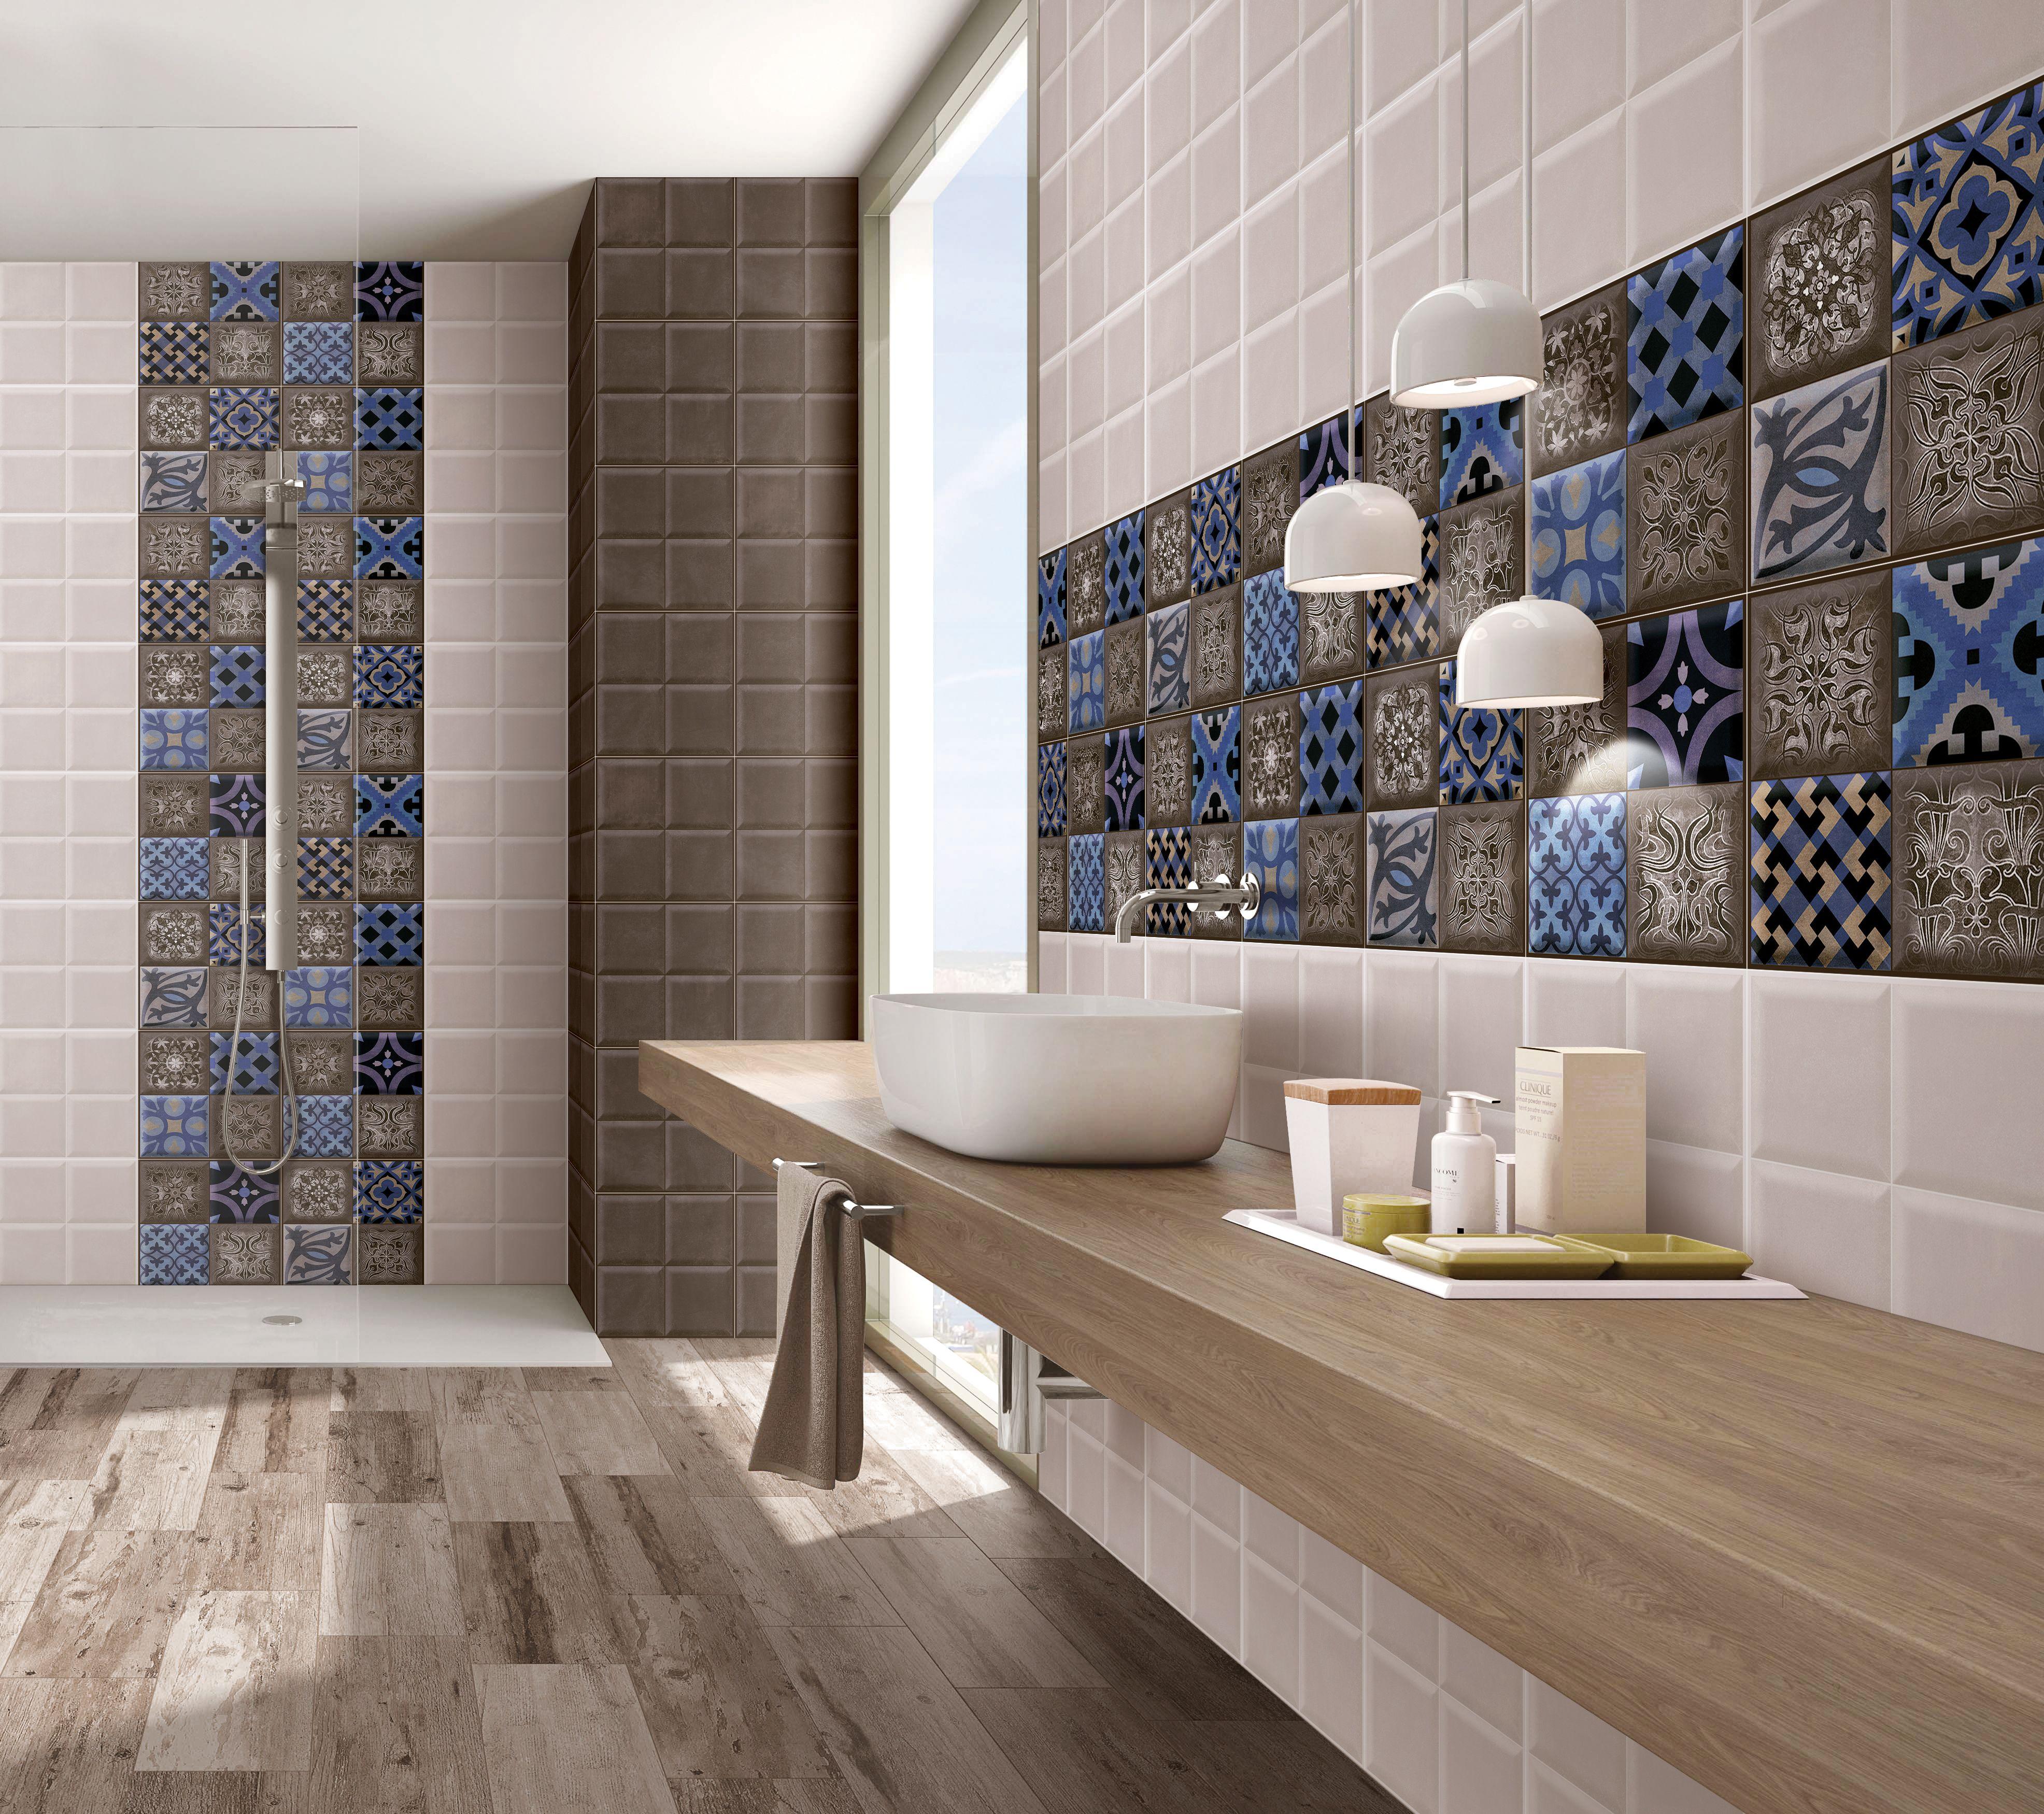 Kitchen Master Tiles Design In Pakistan